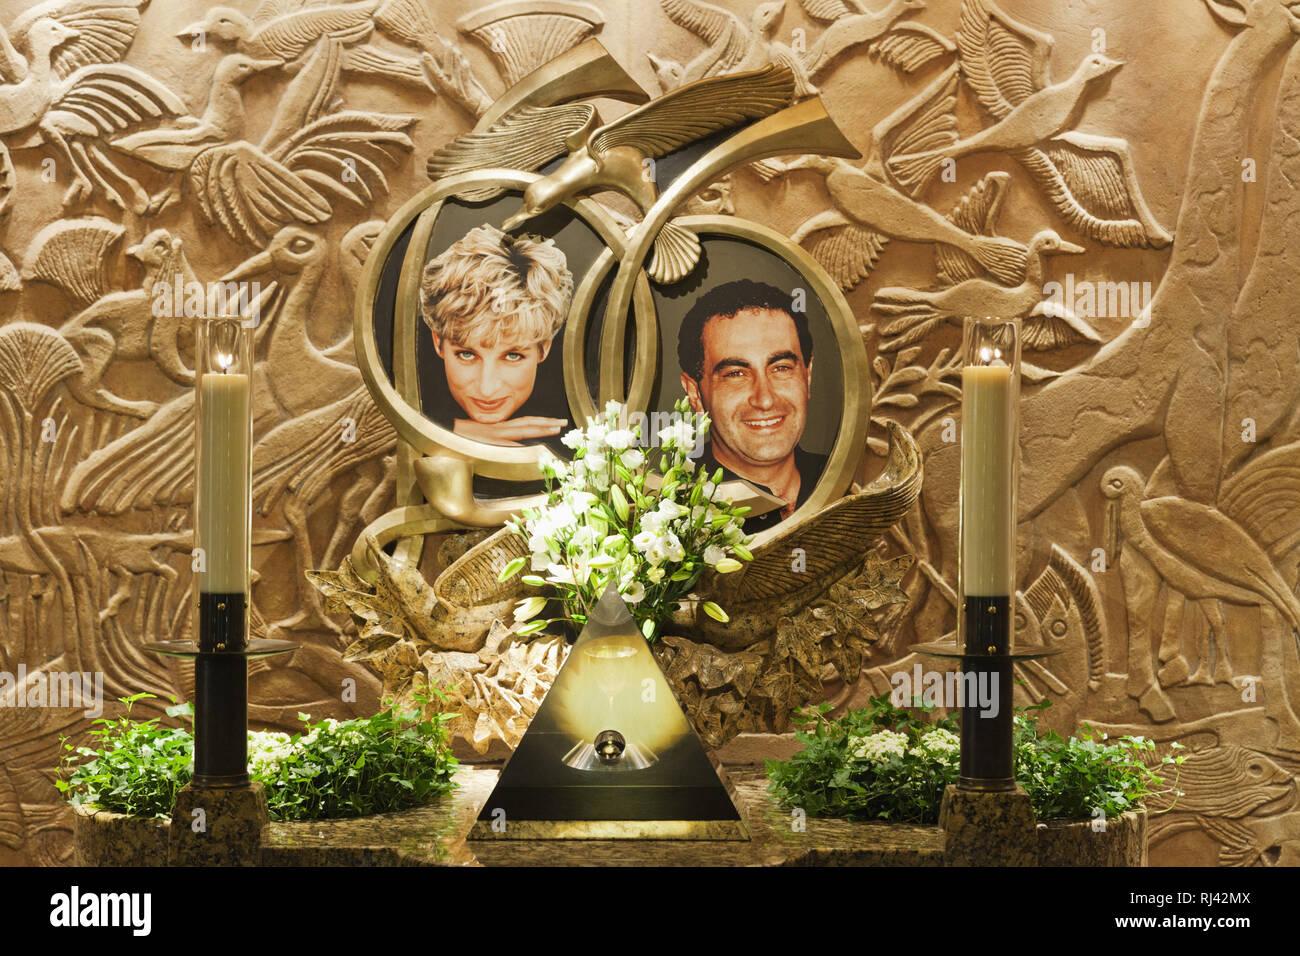 England, London, Knightsbridge, Harrods, Prinzessin Diana und Dodi al Fayed Ged? chtnisbrunnen, Stockbild